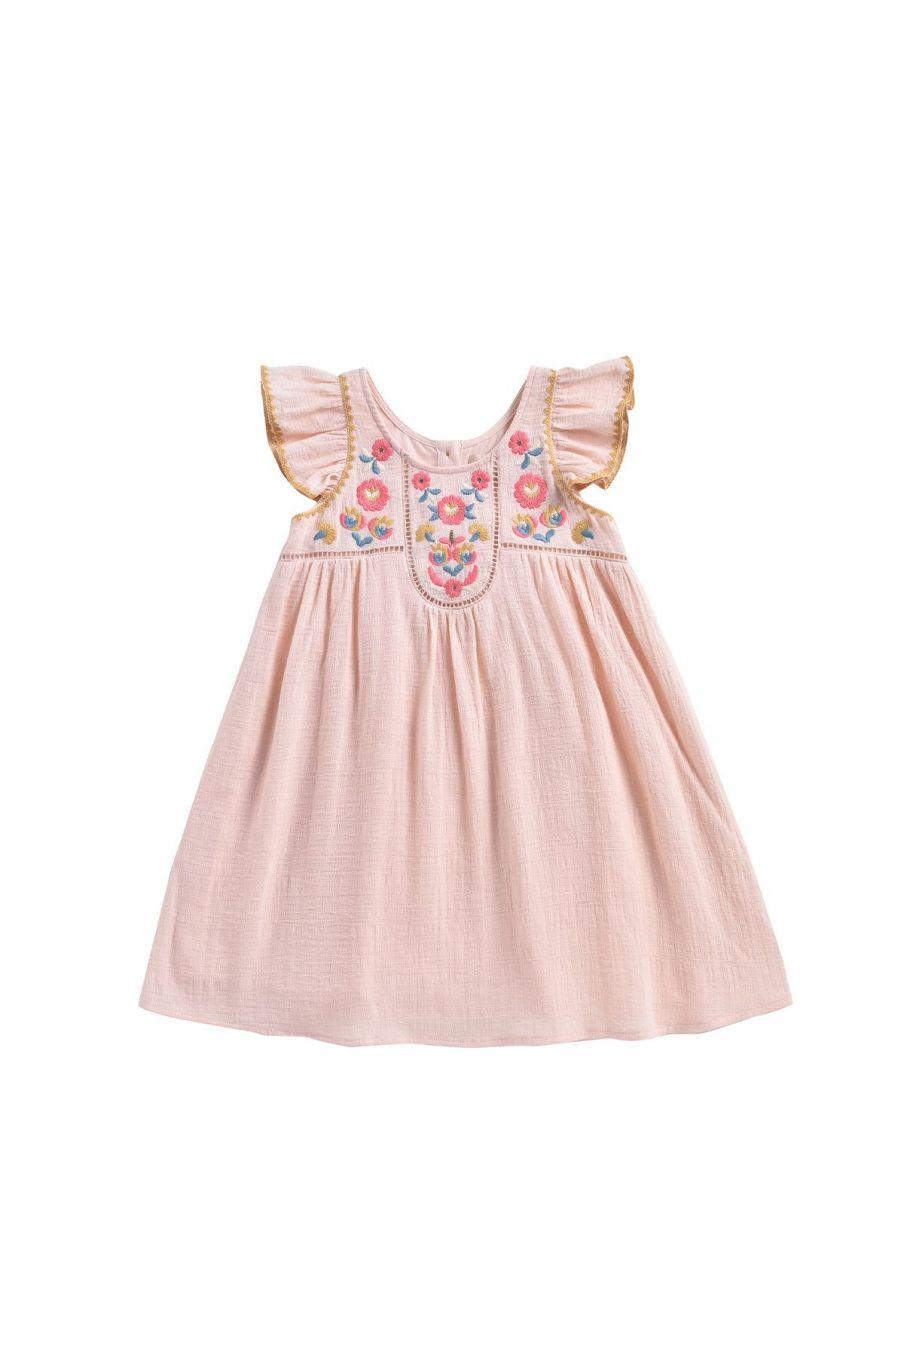 bohemian chic vintage dress girl jendahiu blush